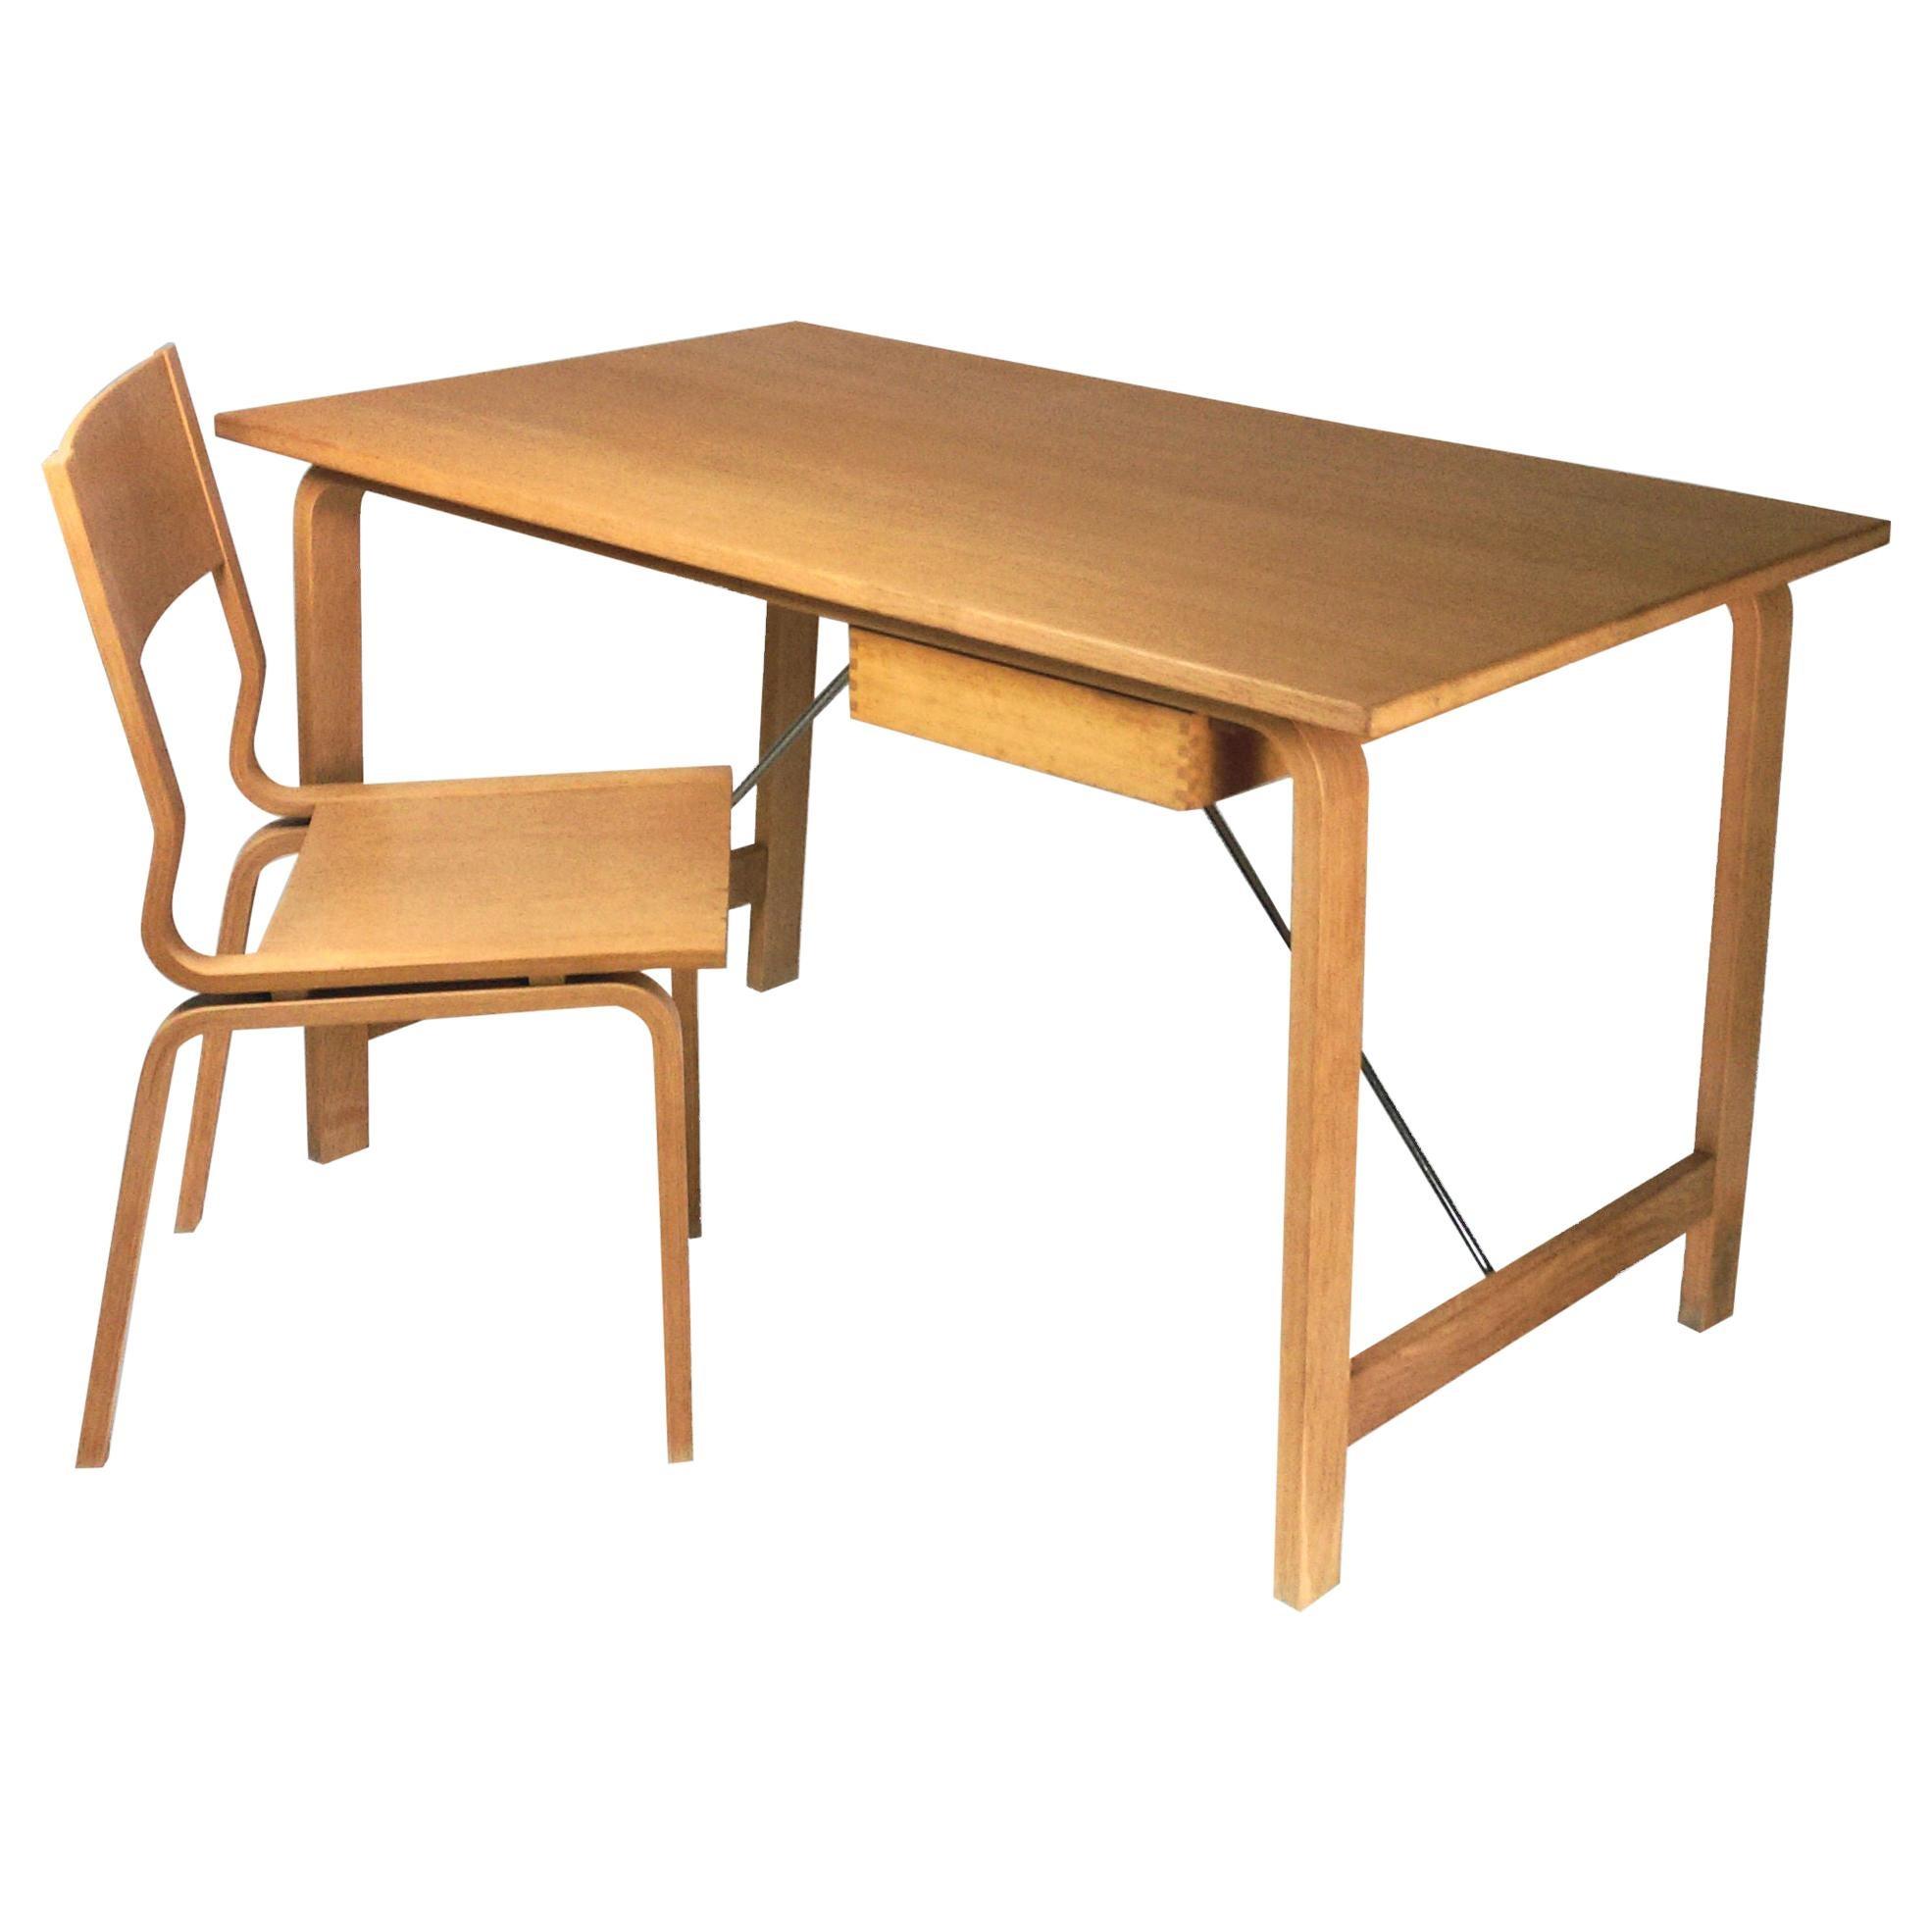 1965 Danish Arne Jacobsen Saint Catherines Desk and Chair in Oak by Fritz Hansen